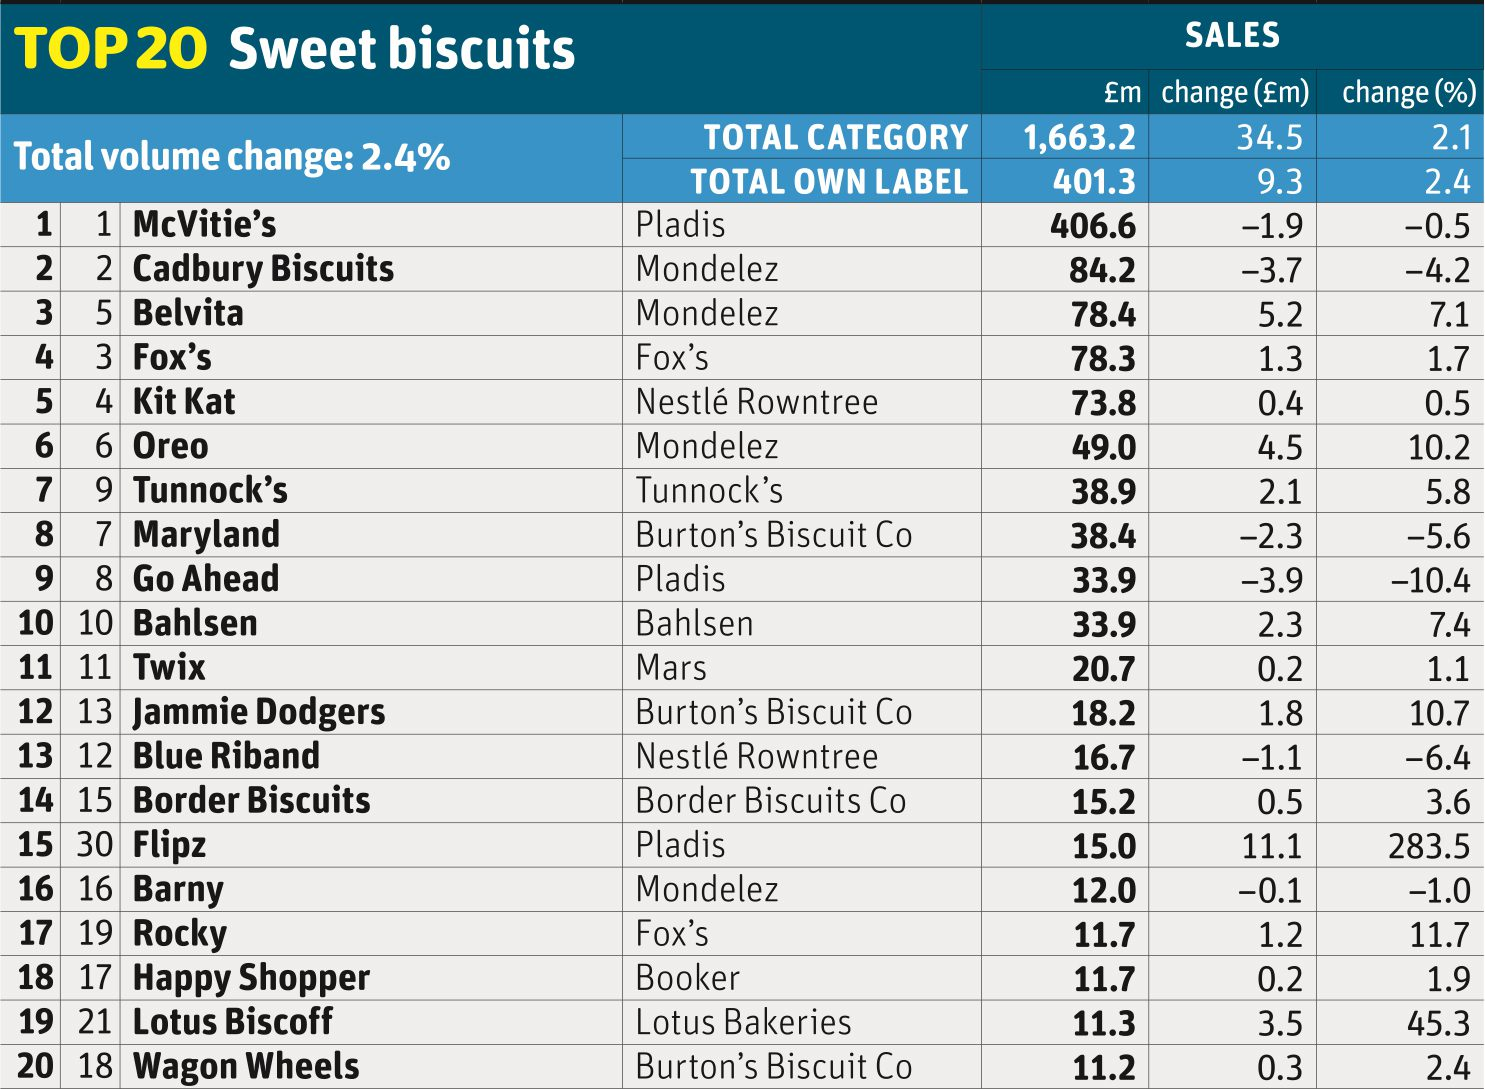 Top 20 Sweet biscuits